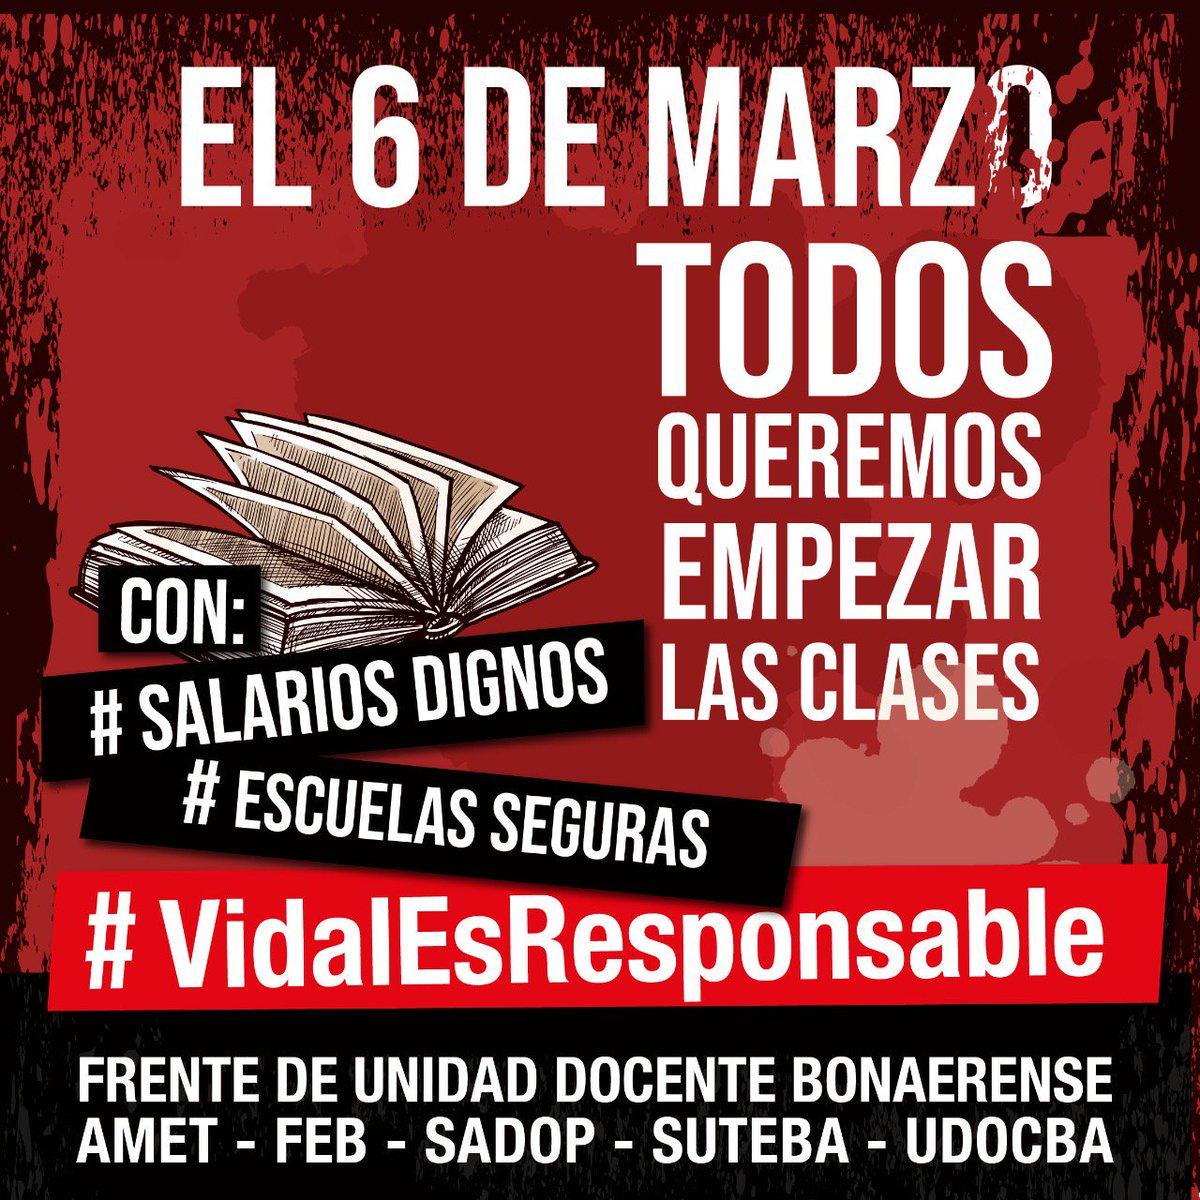 Alberto Mendoza Padilla's photo on #VidalEsResponsable